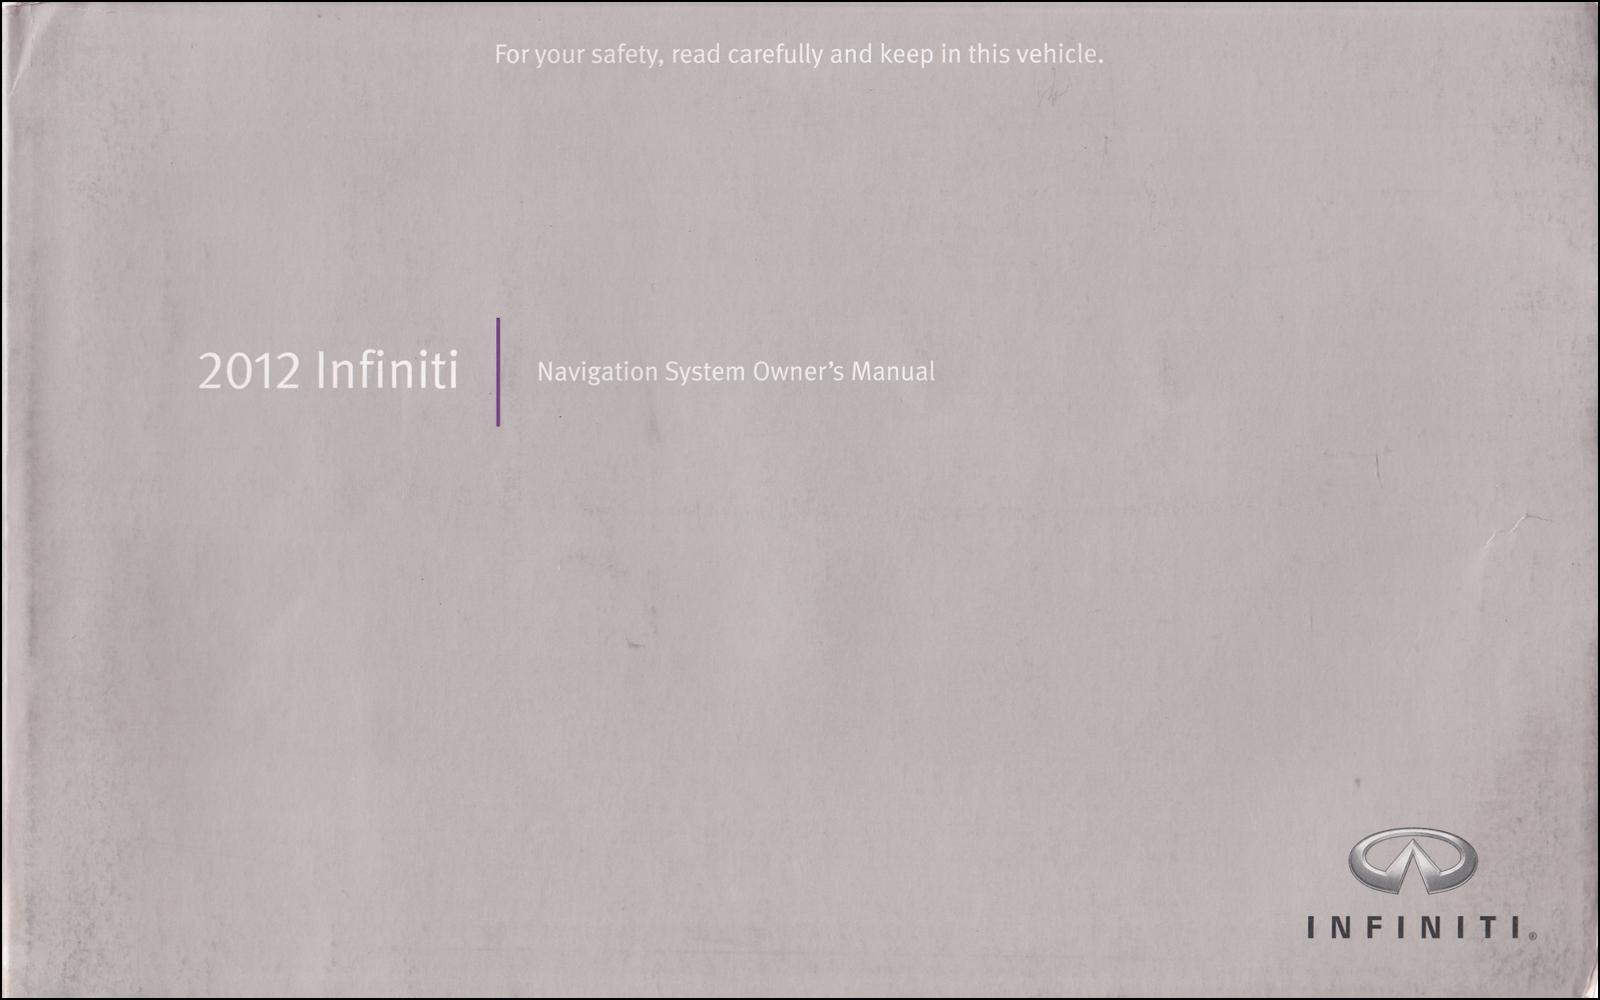 2012 Infiniti Navigation System Owner's Manual Original